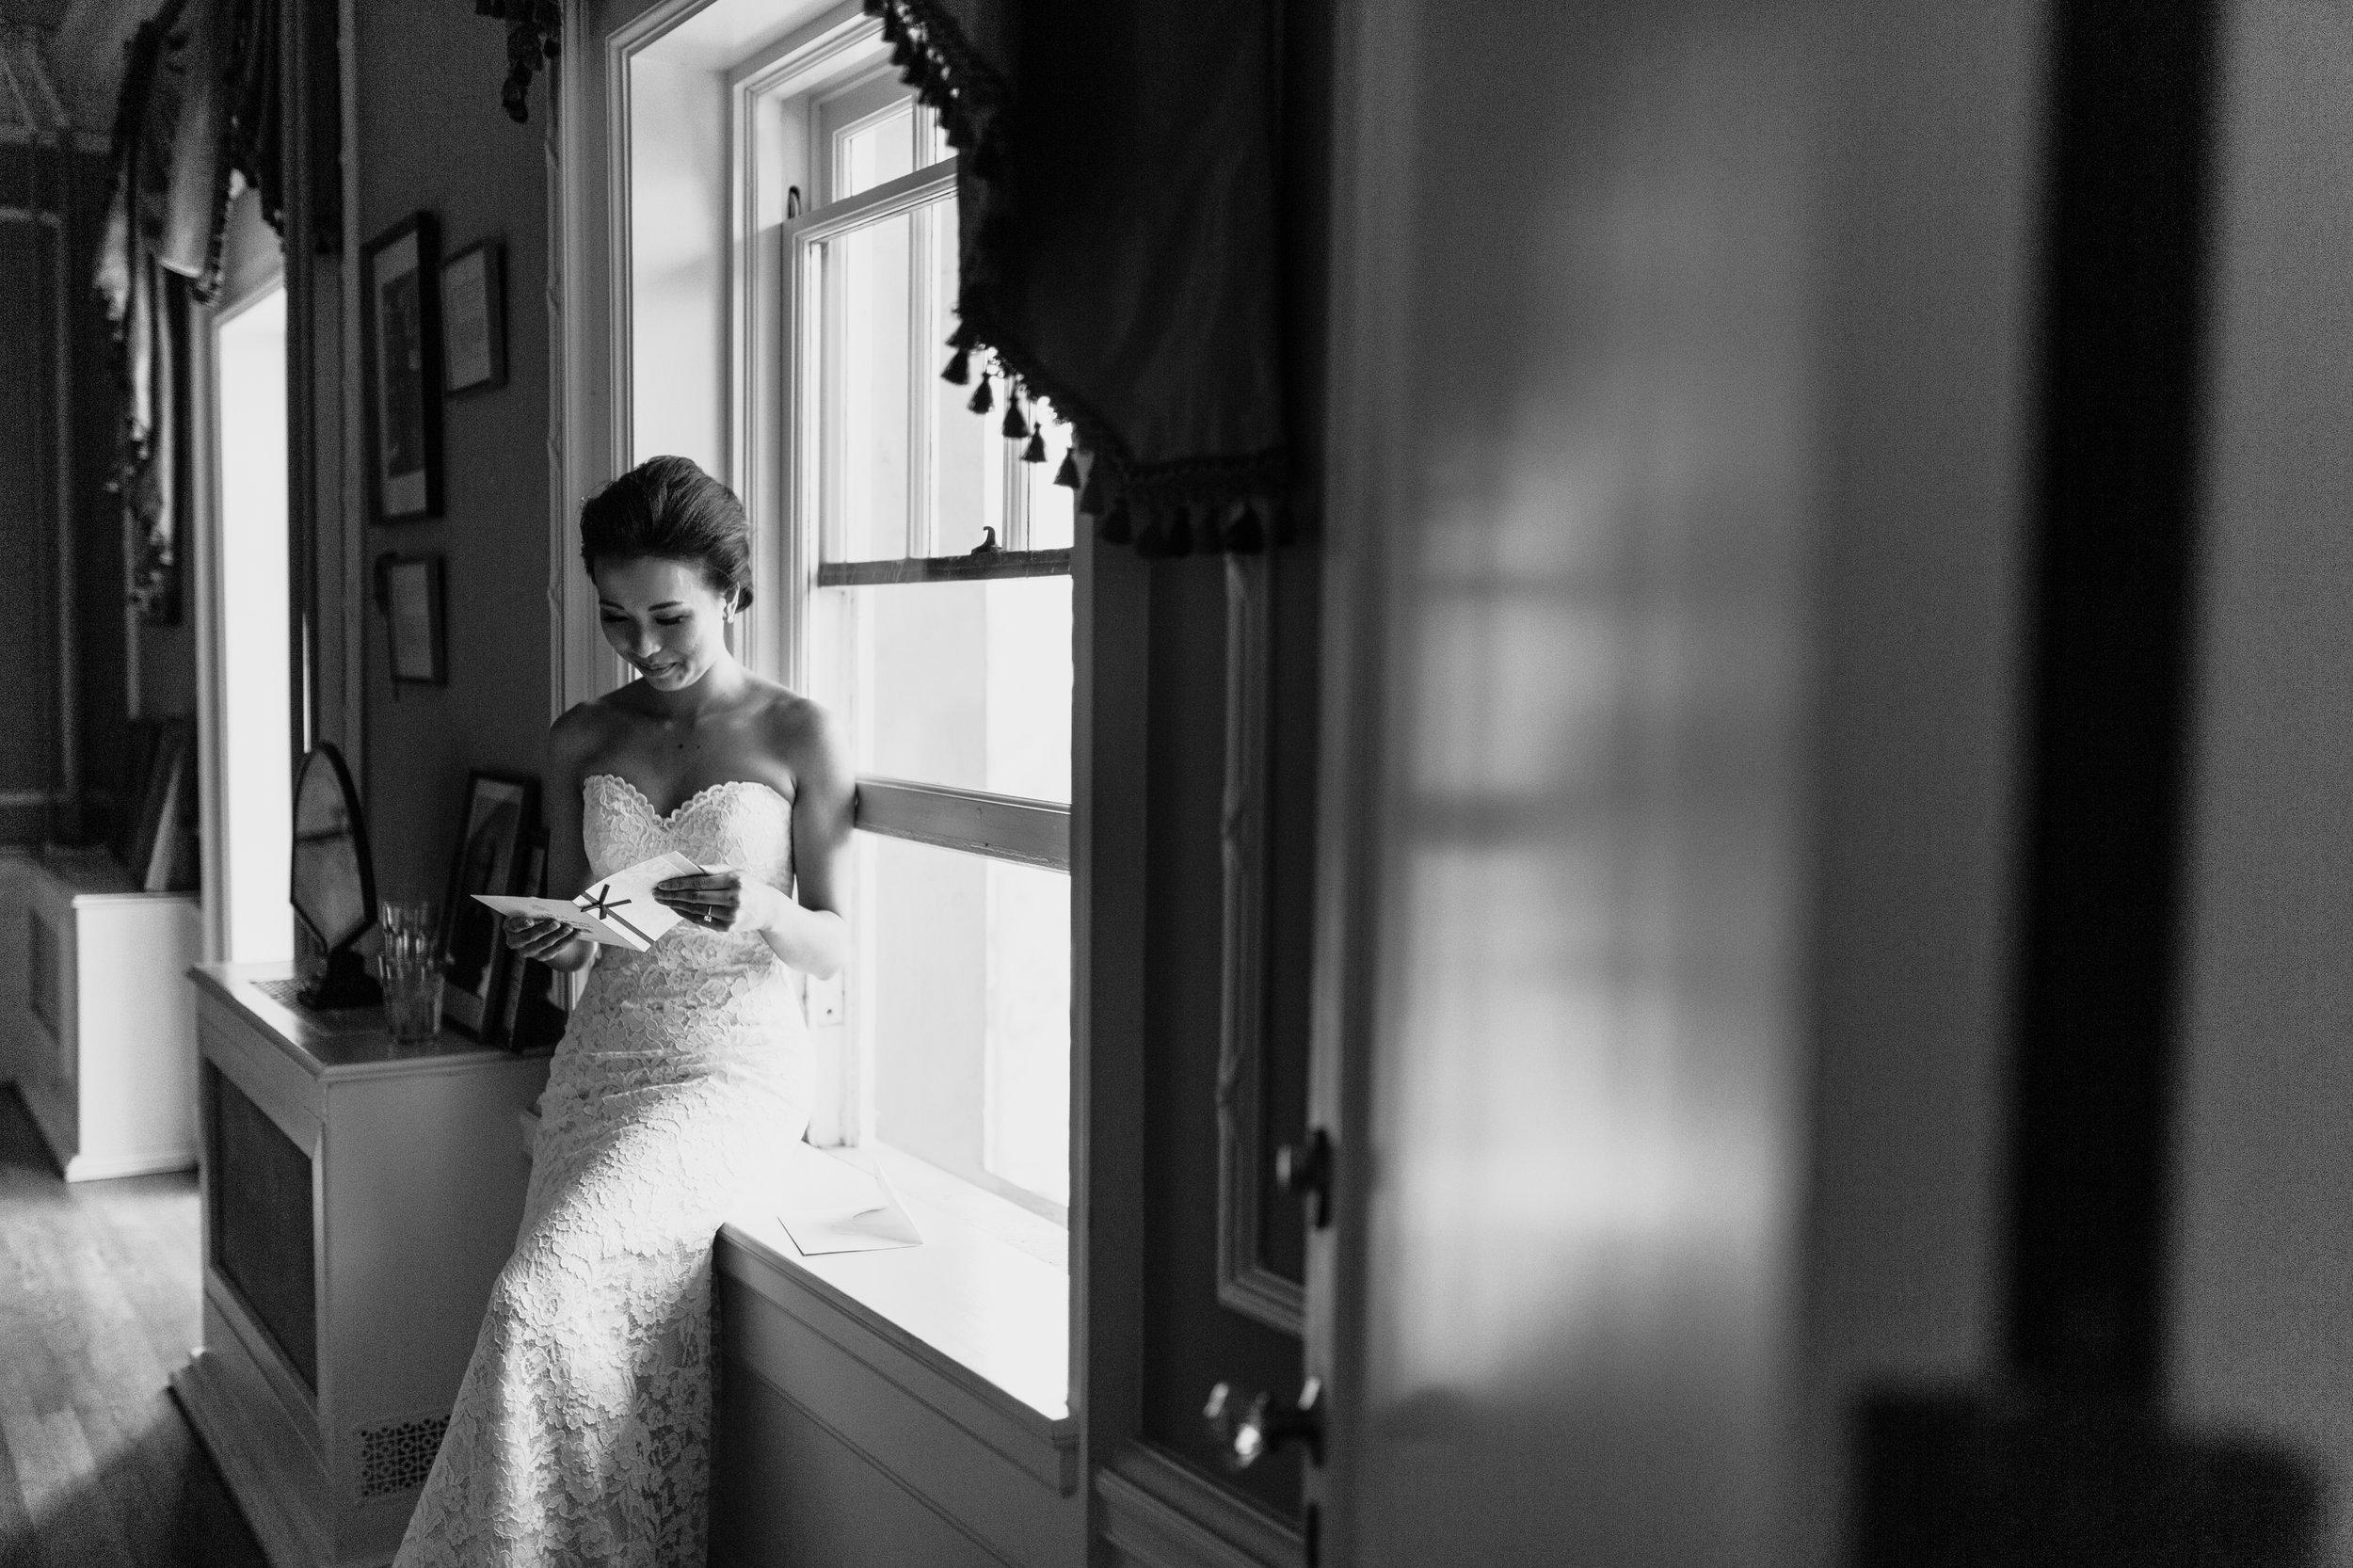 herafilms_wedding_lisa_arthur_hera_selects-14.jpg